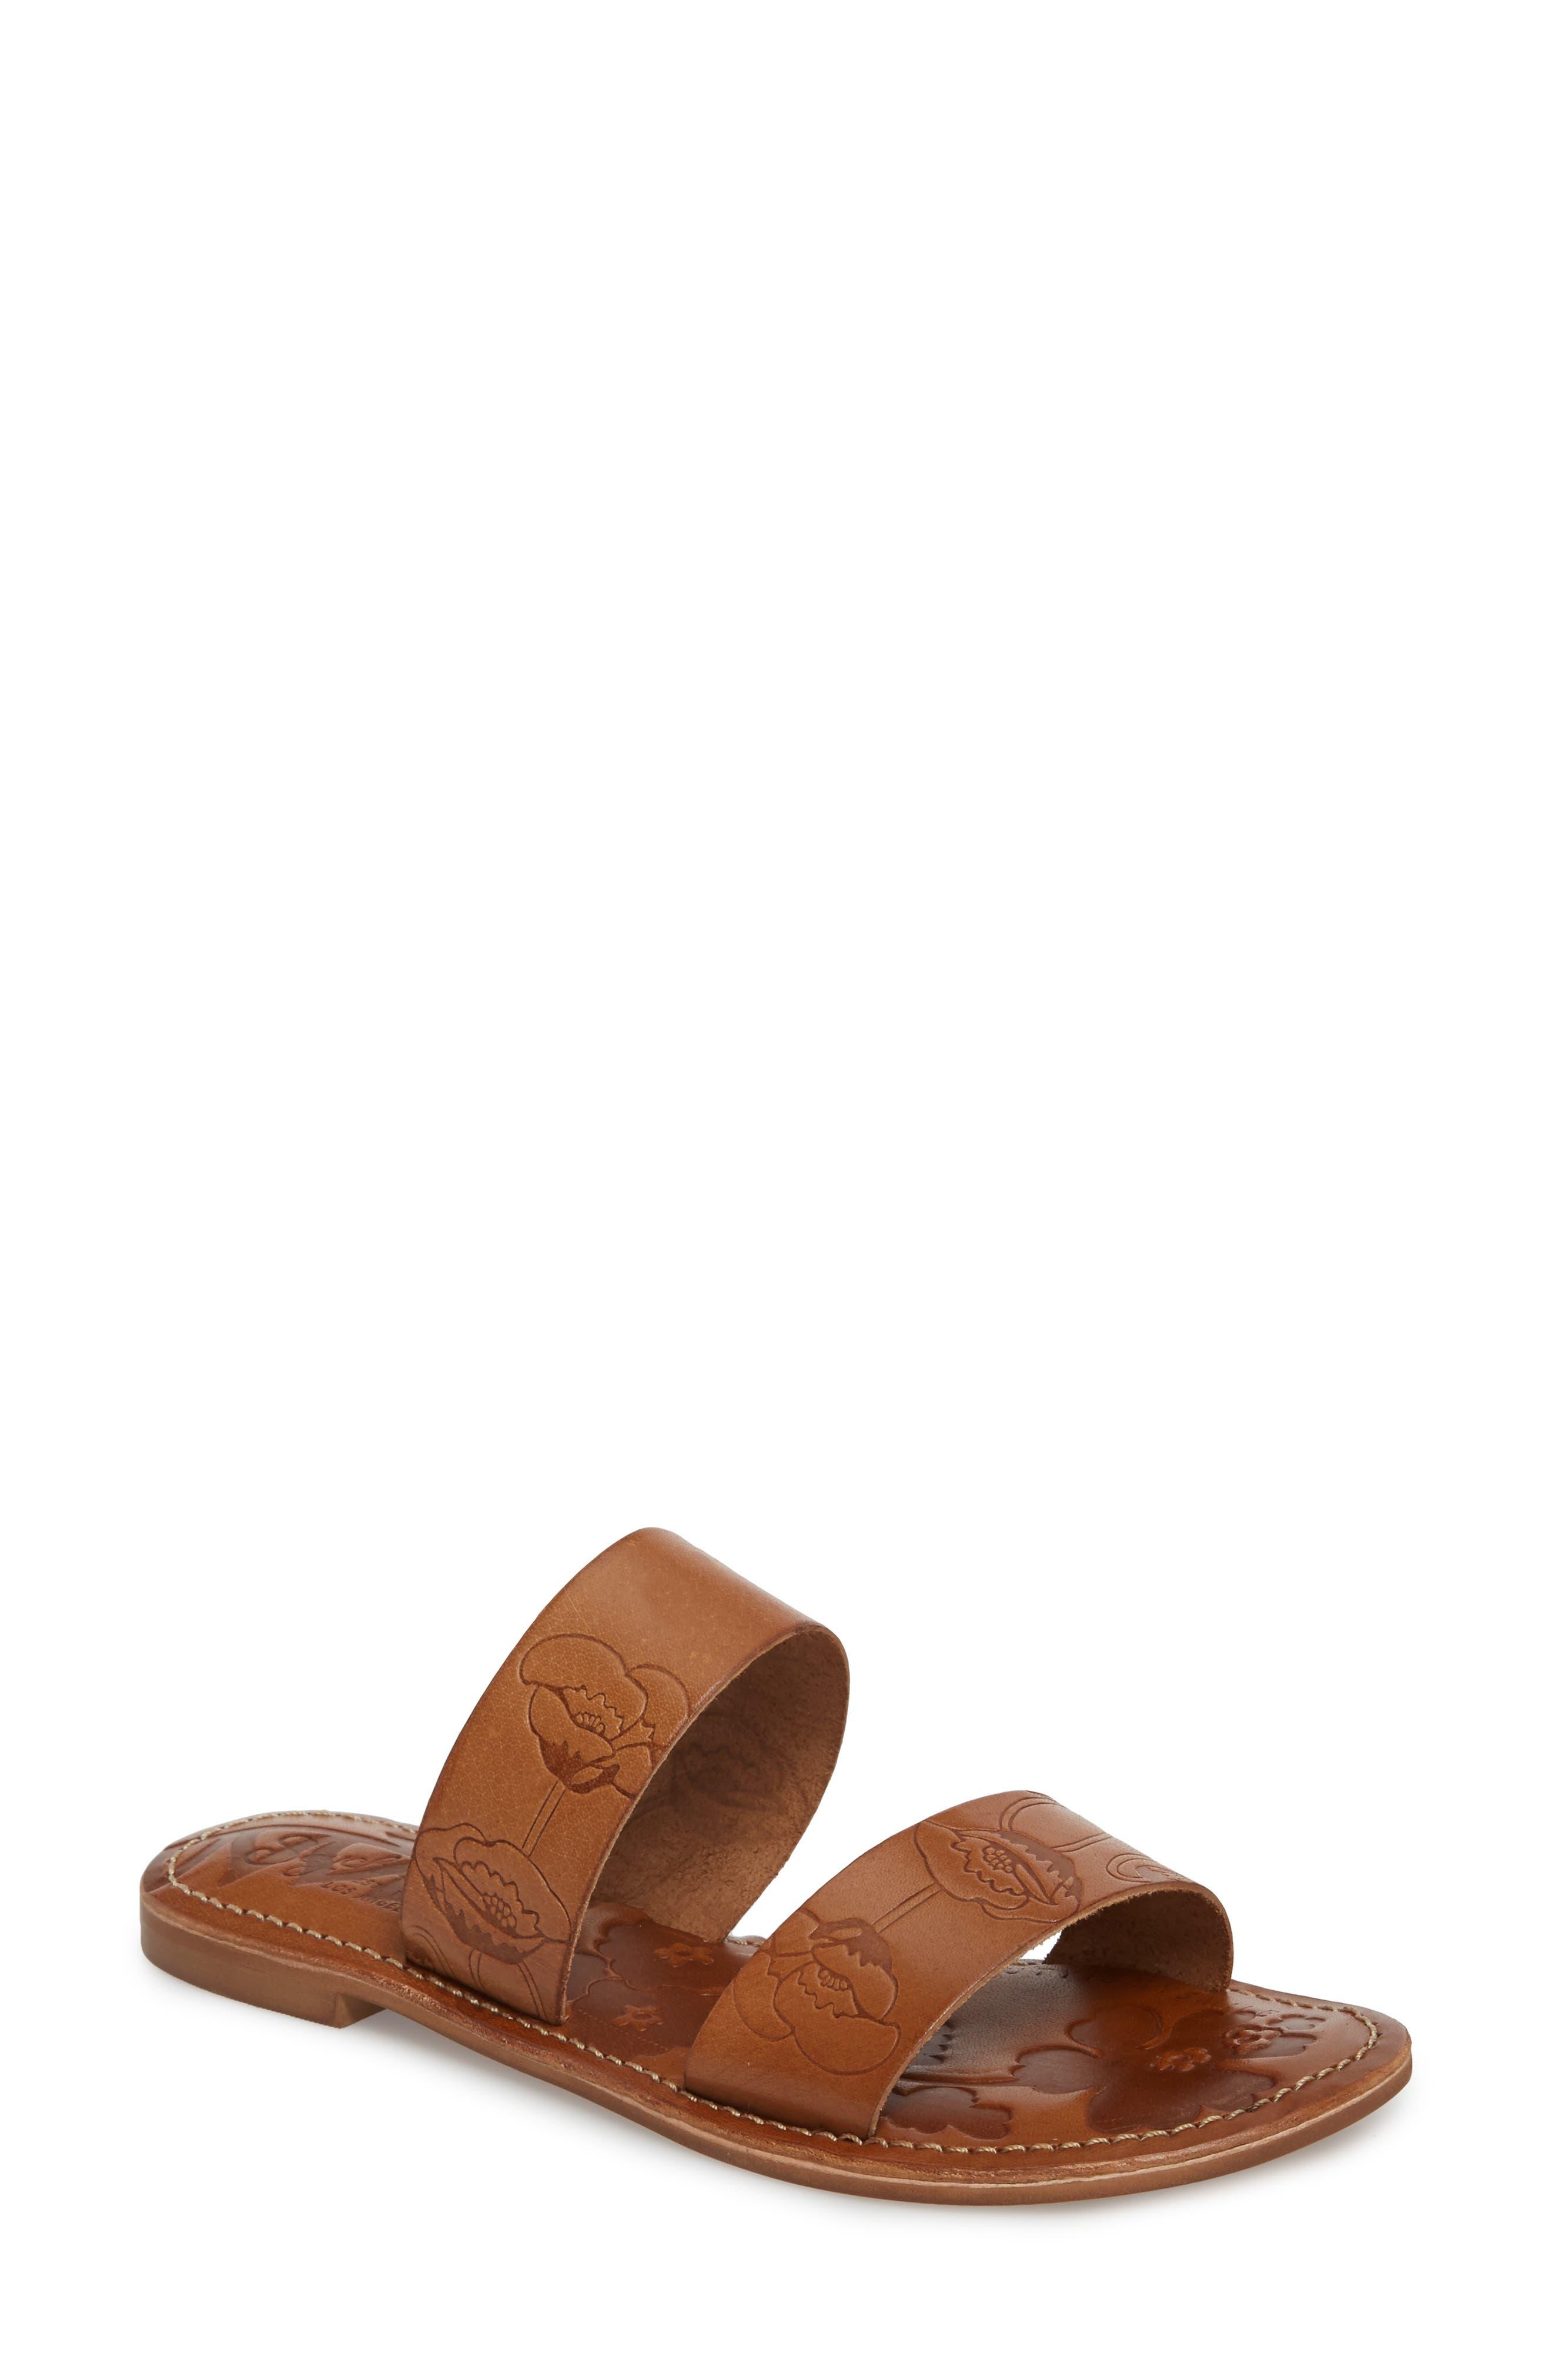 Sheroes Slide Sandal,                         Main,                         color, BROWN LEATHER